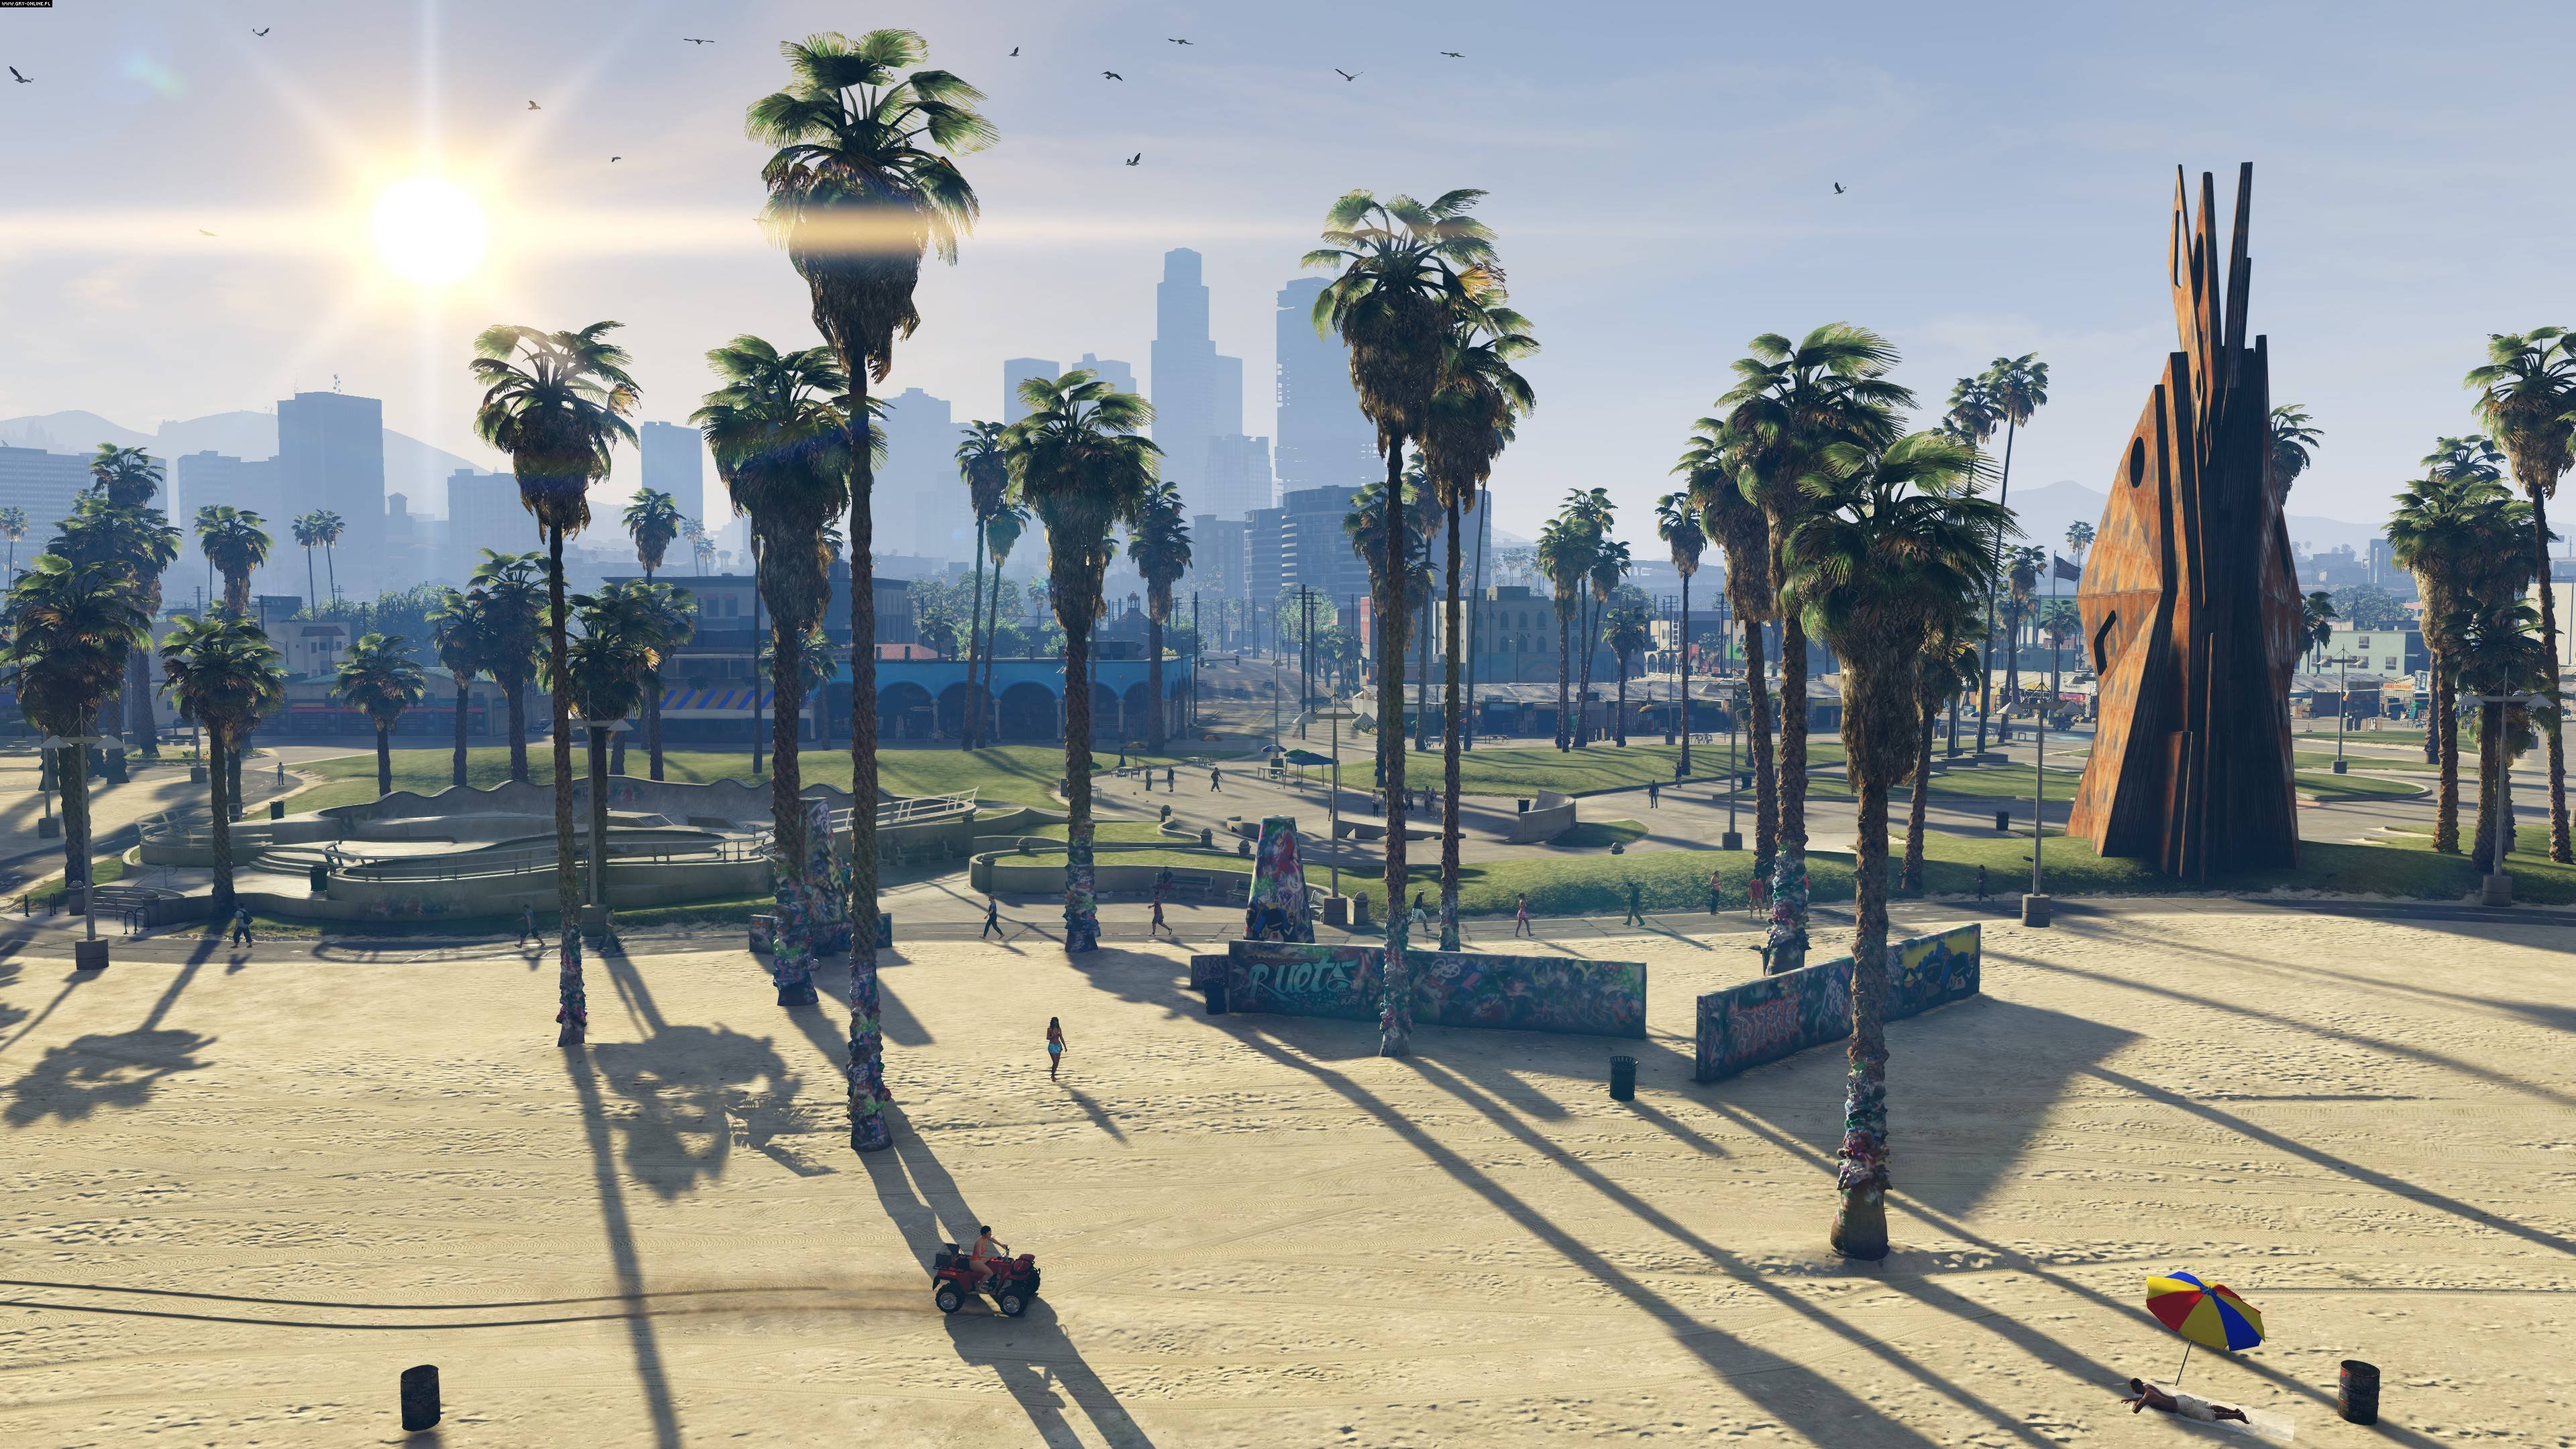 Grand Theft Auto V PC Games Image 6/396, Rockstar Games